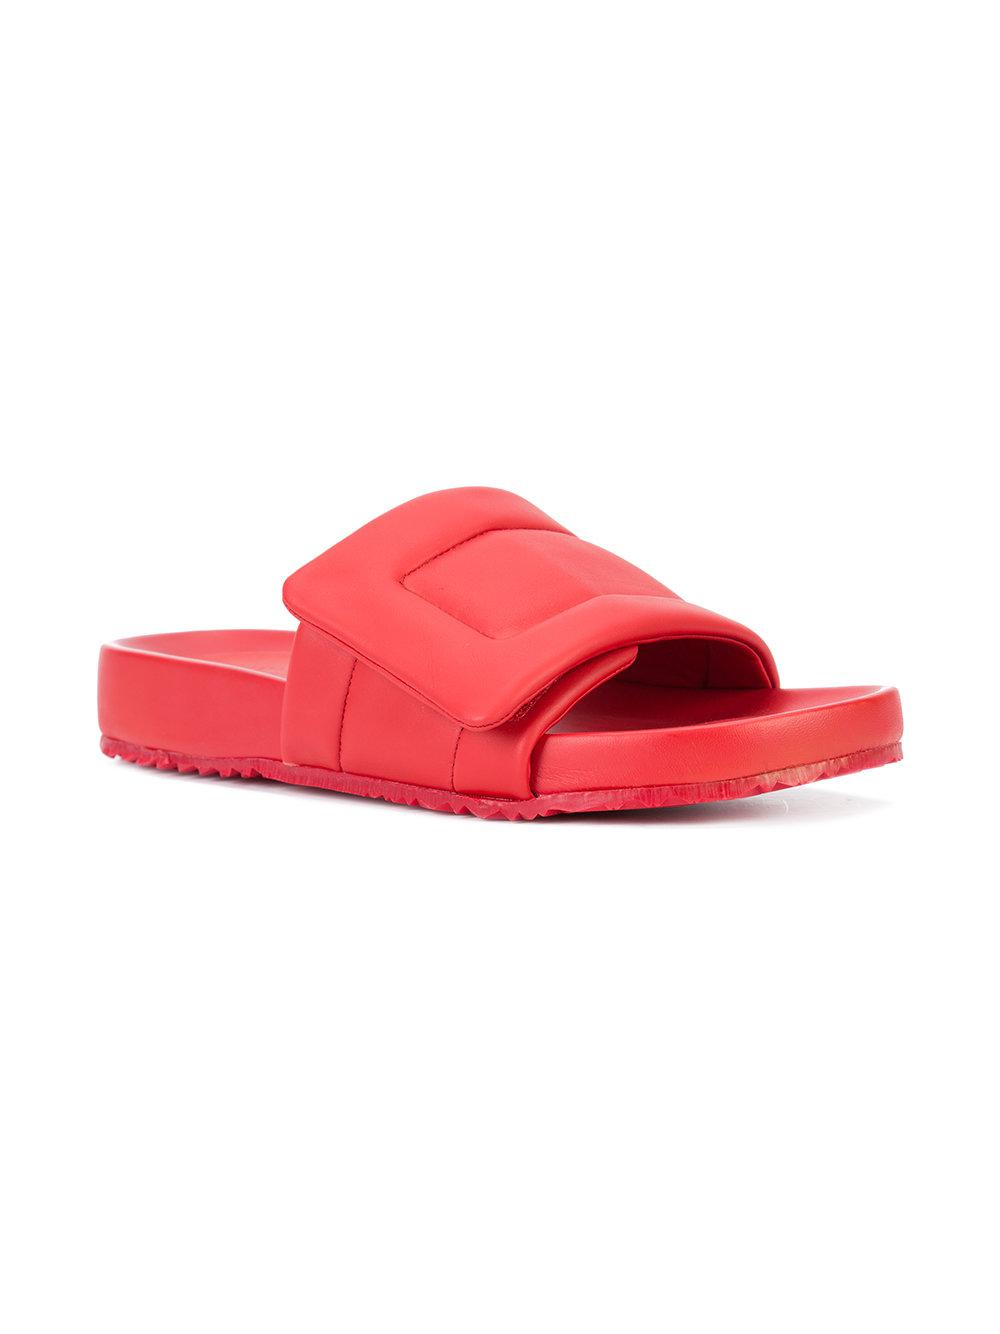 sneakers for cheap 0b365 ddf3d maison-martin-margiela-Red-Future-Slides.jpeg